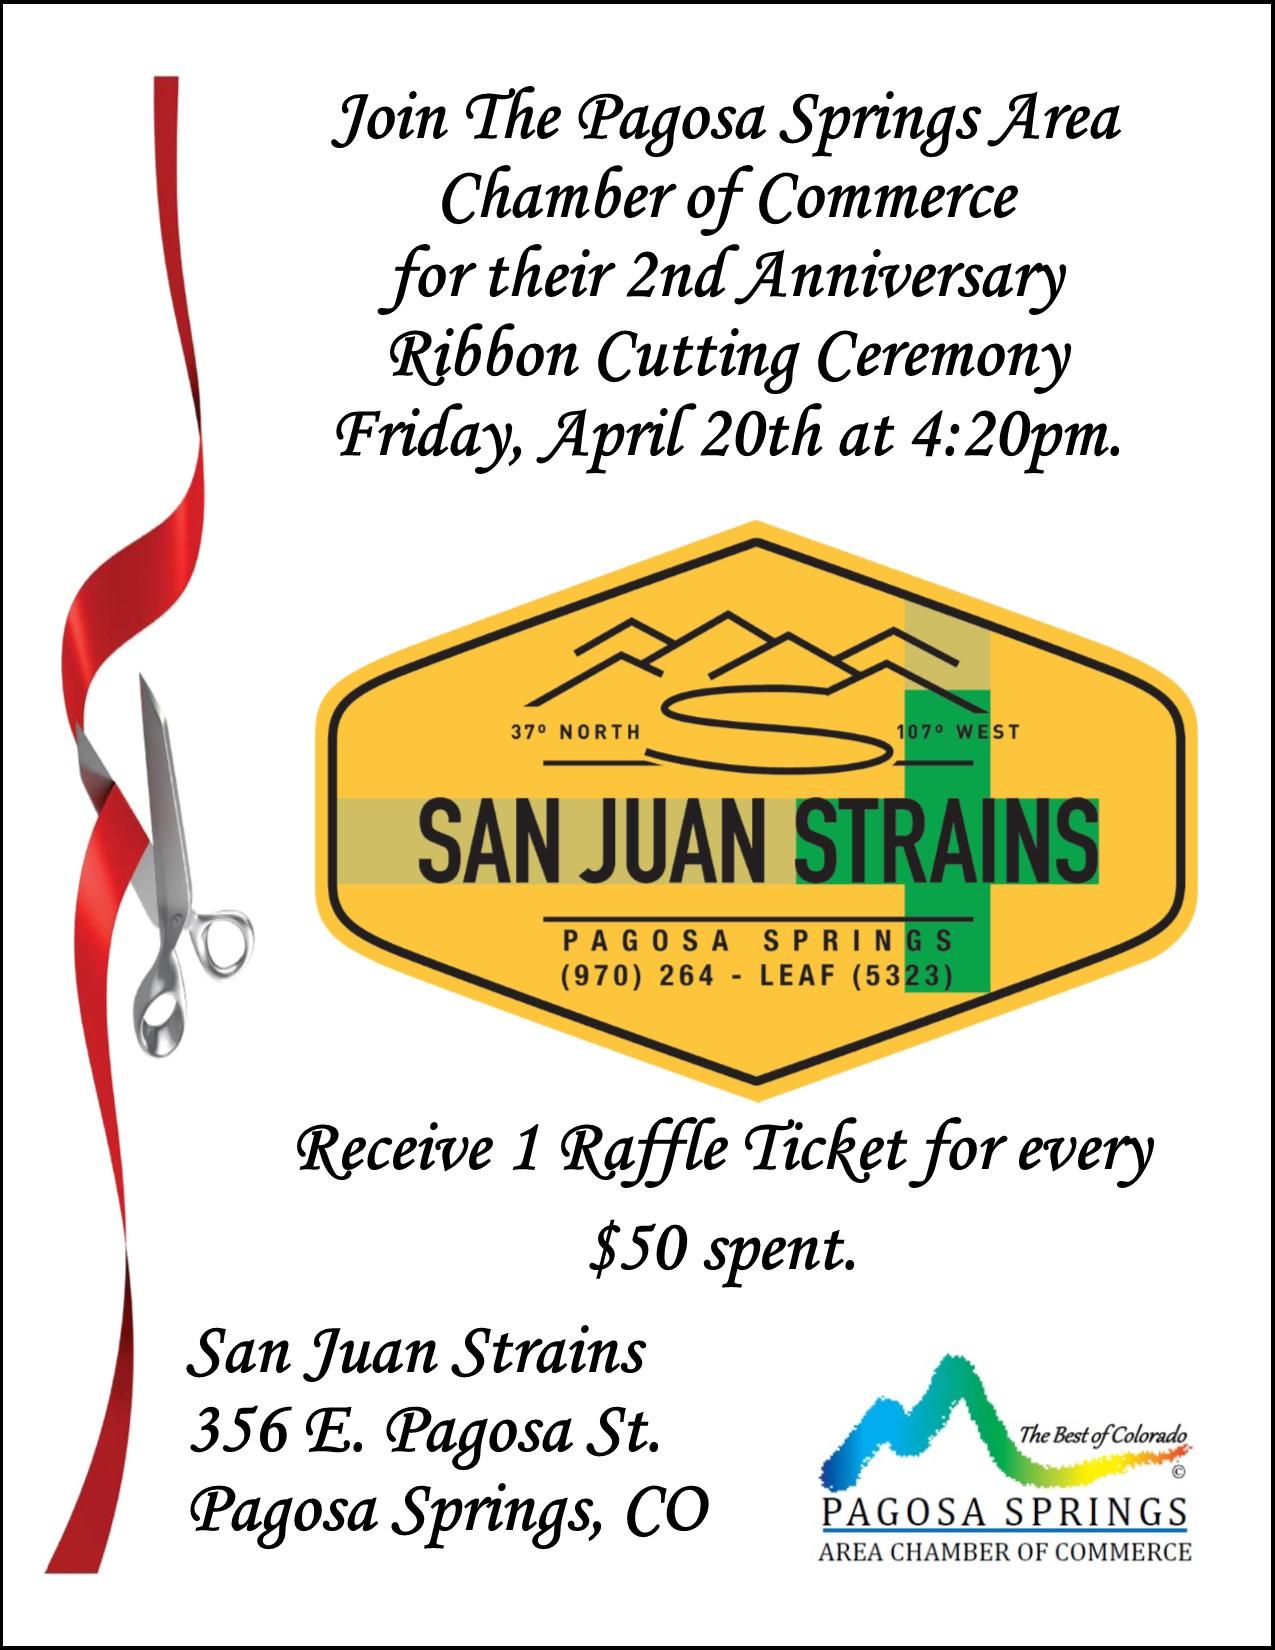 Ribbon Cutting to Celebrate San Juan Strains 2nd Anniversary